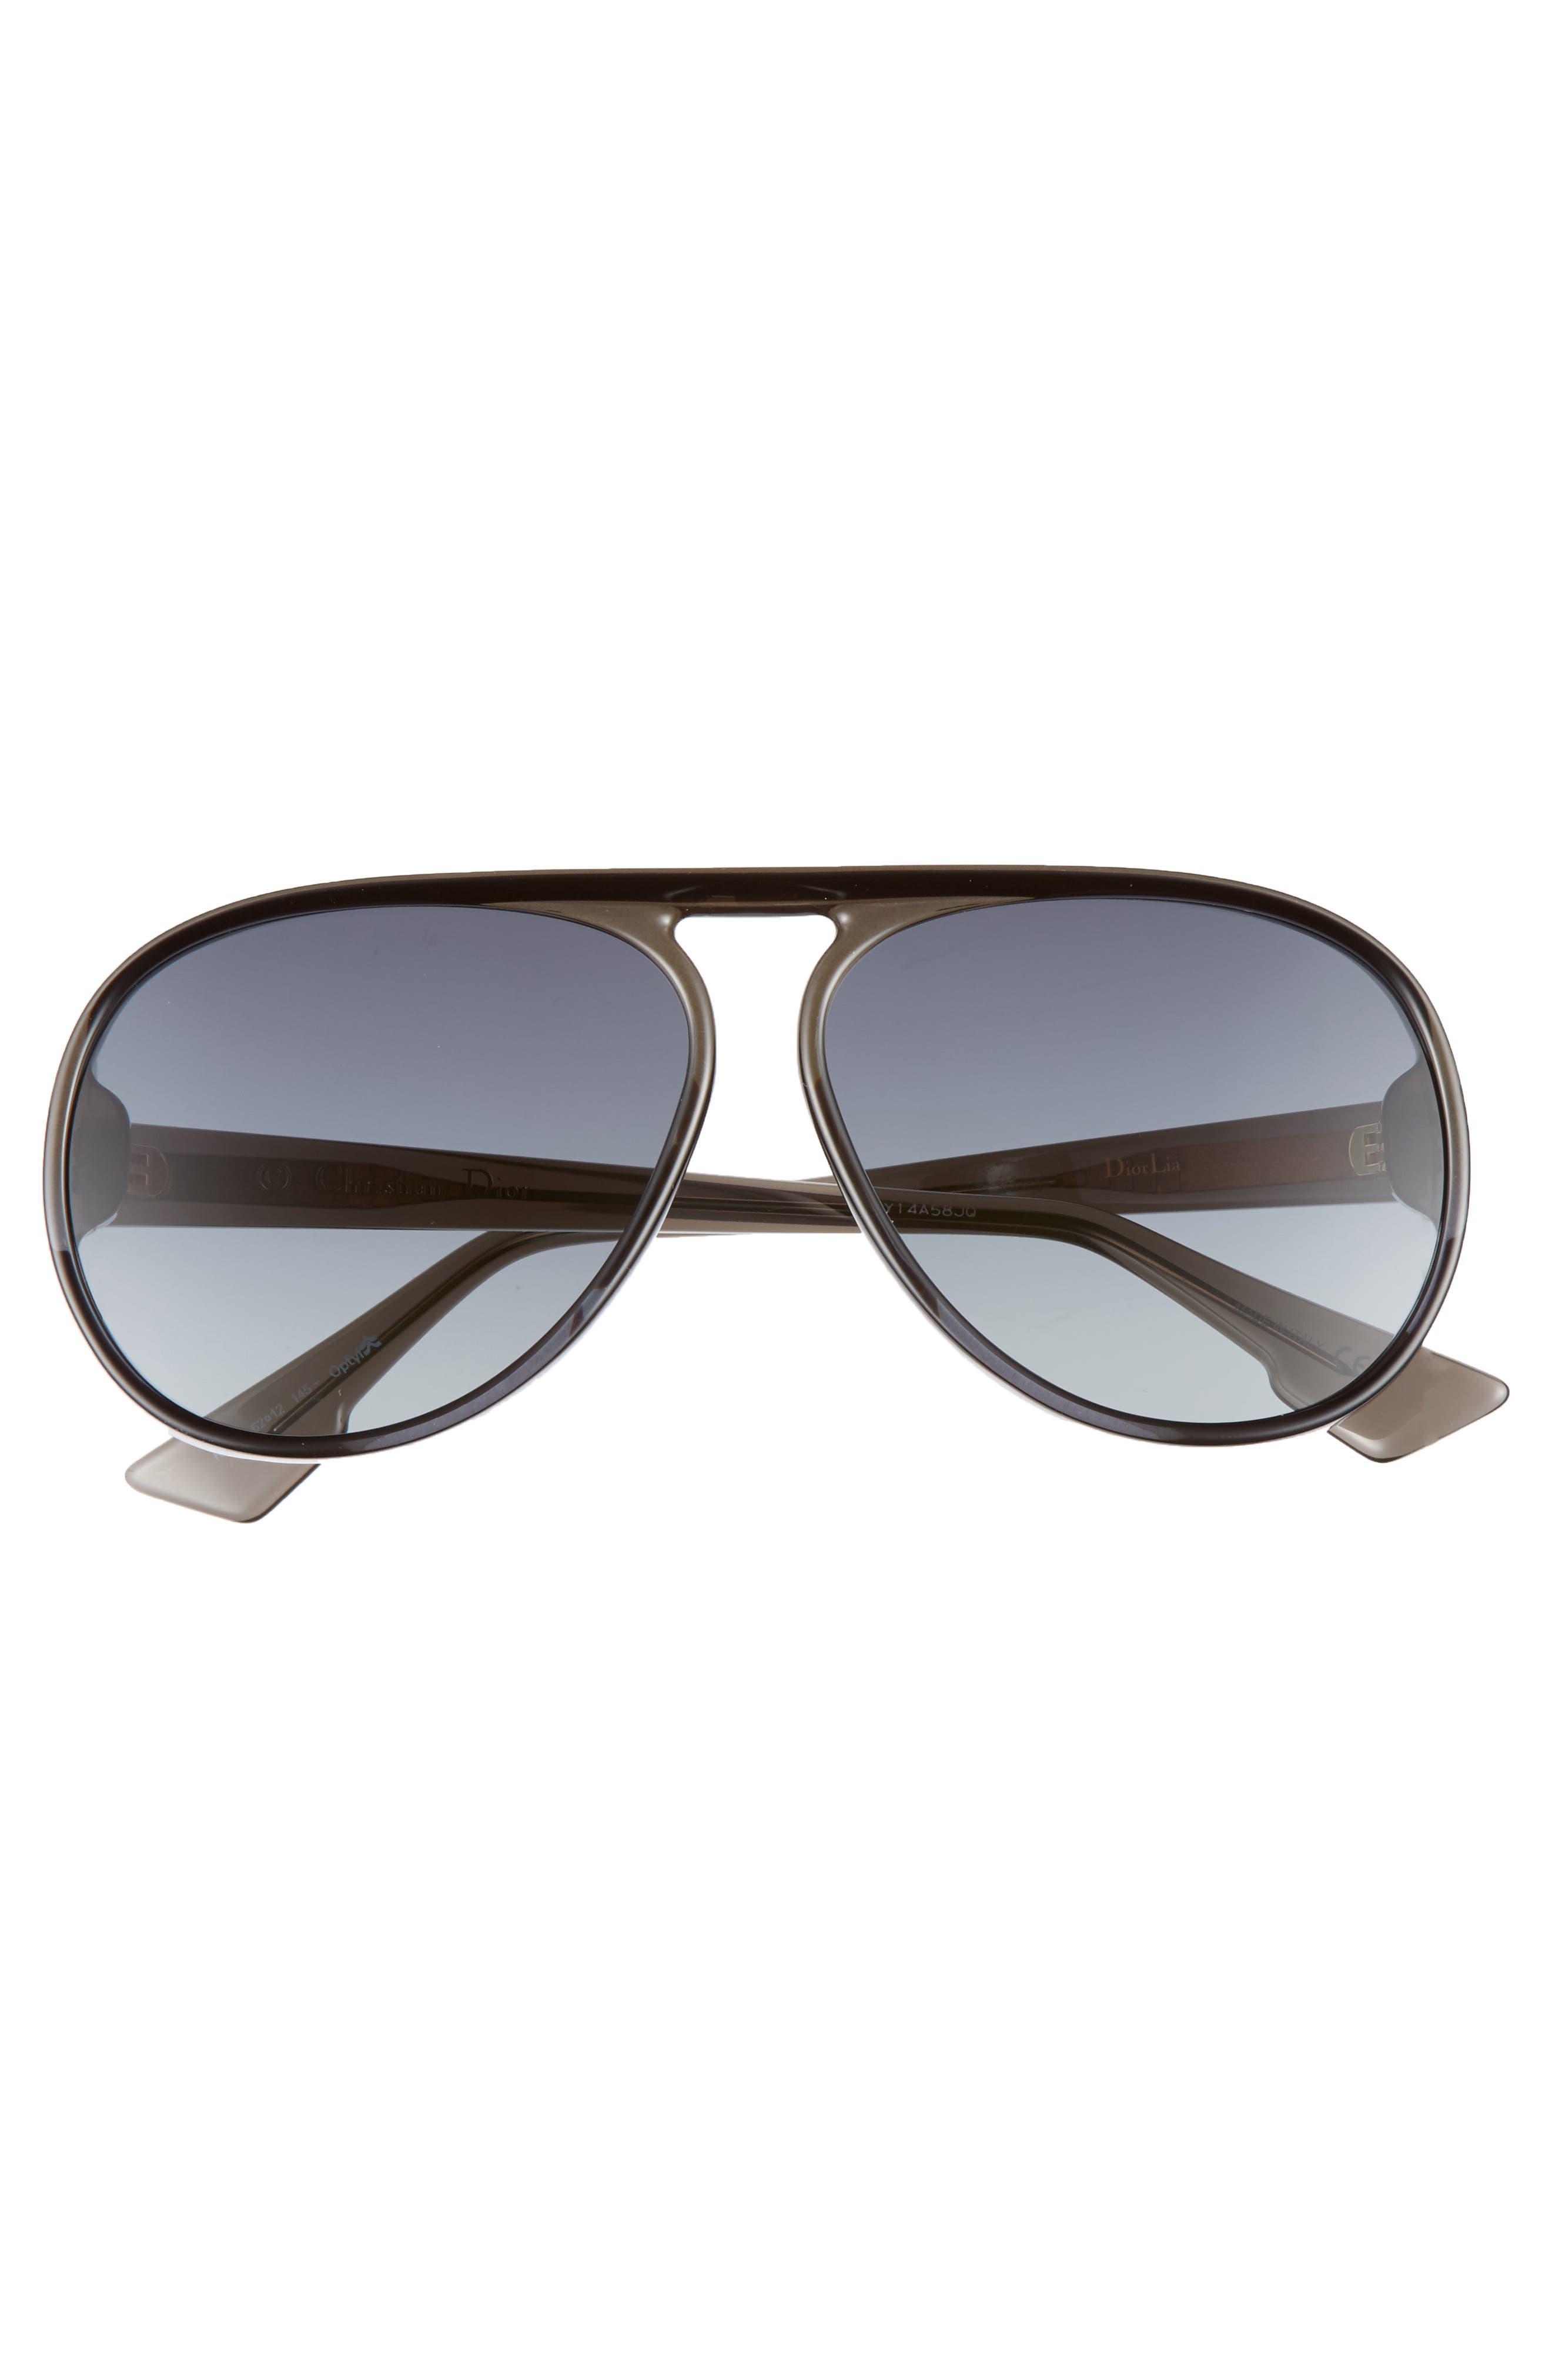 Lia 62mm Oversize Aviator Sunglasses,                             Alternate thumbnail 3, color,                             020